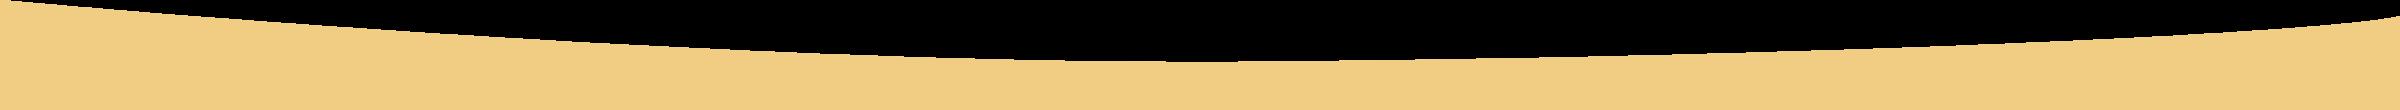 Golden stage graphic